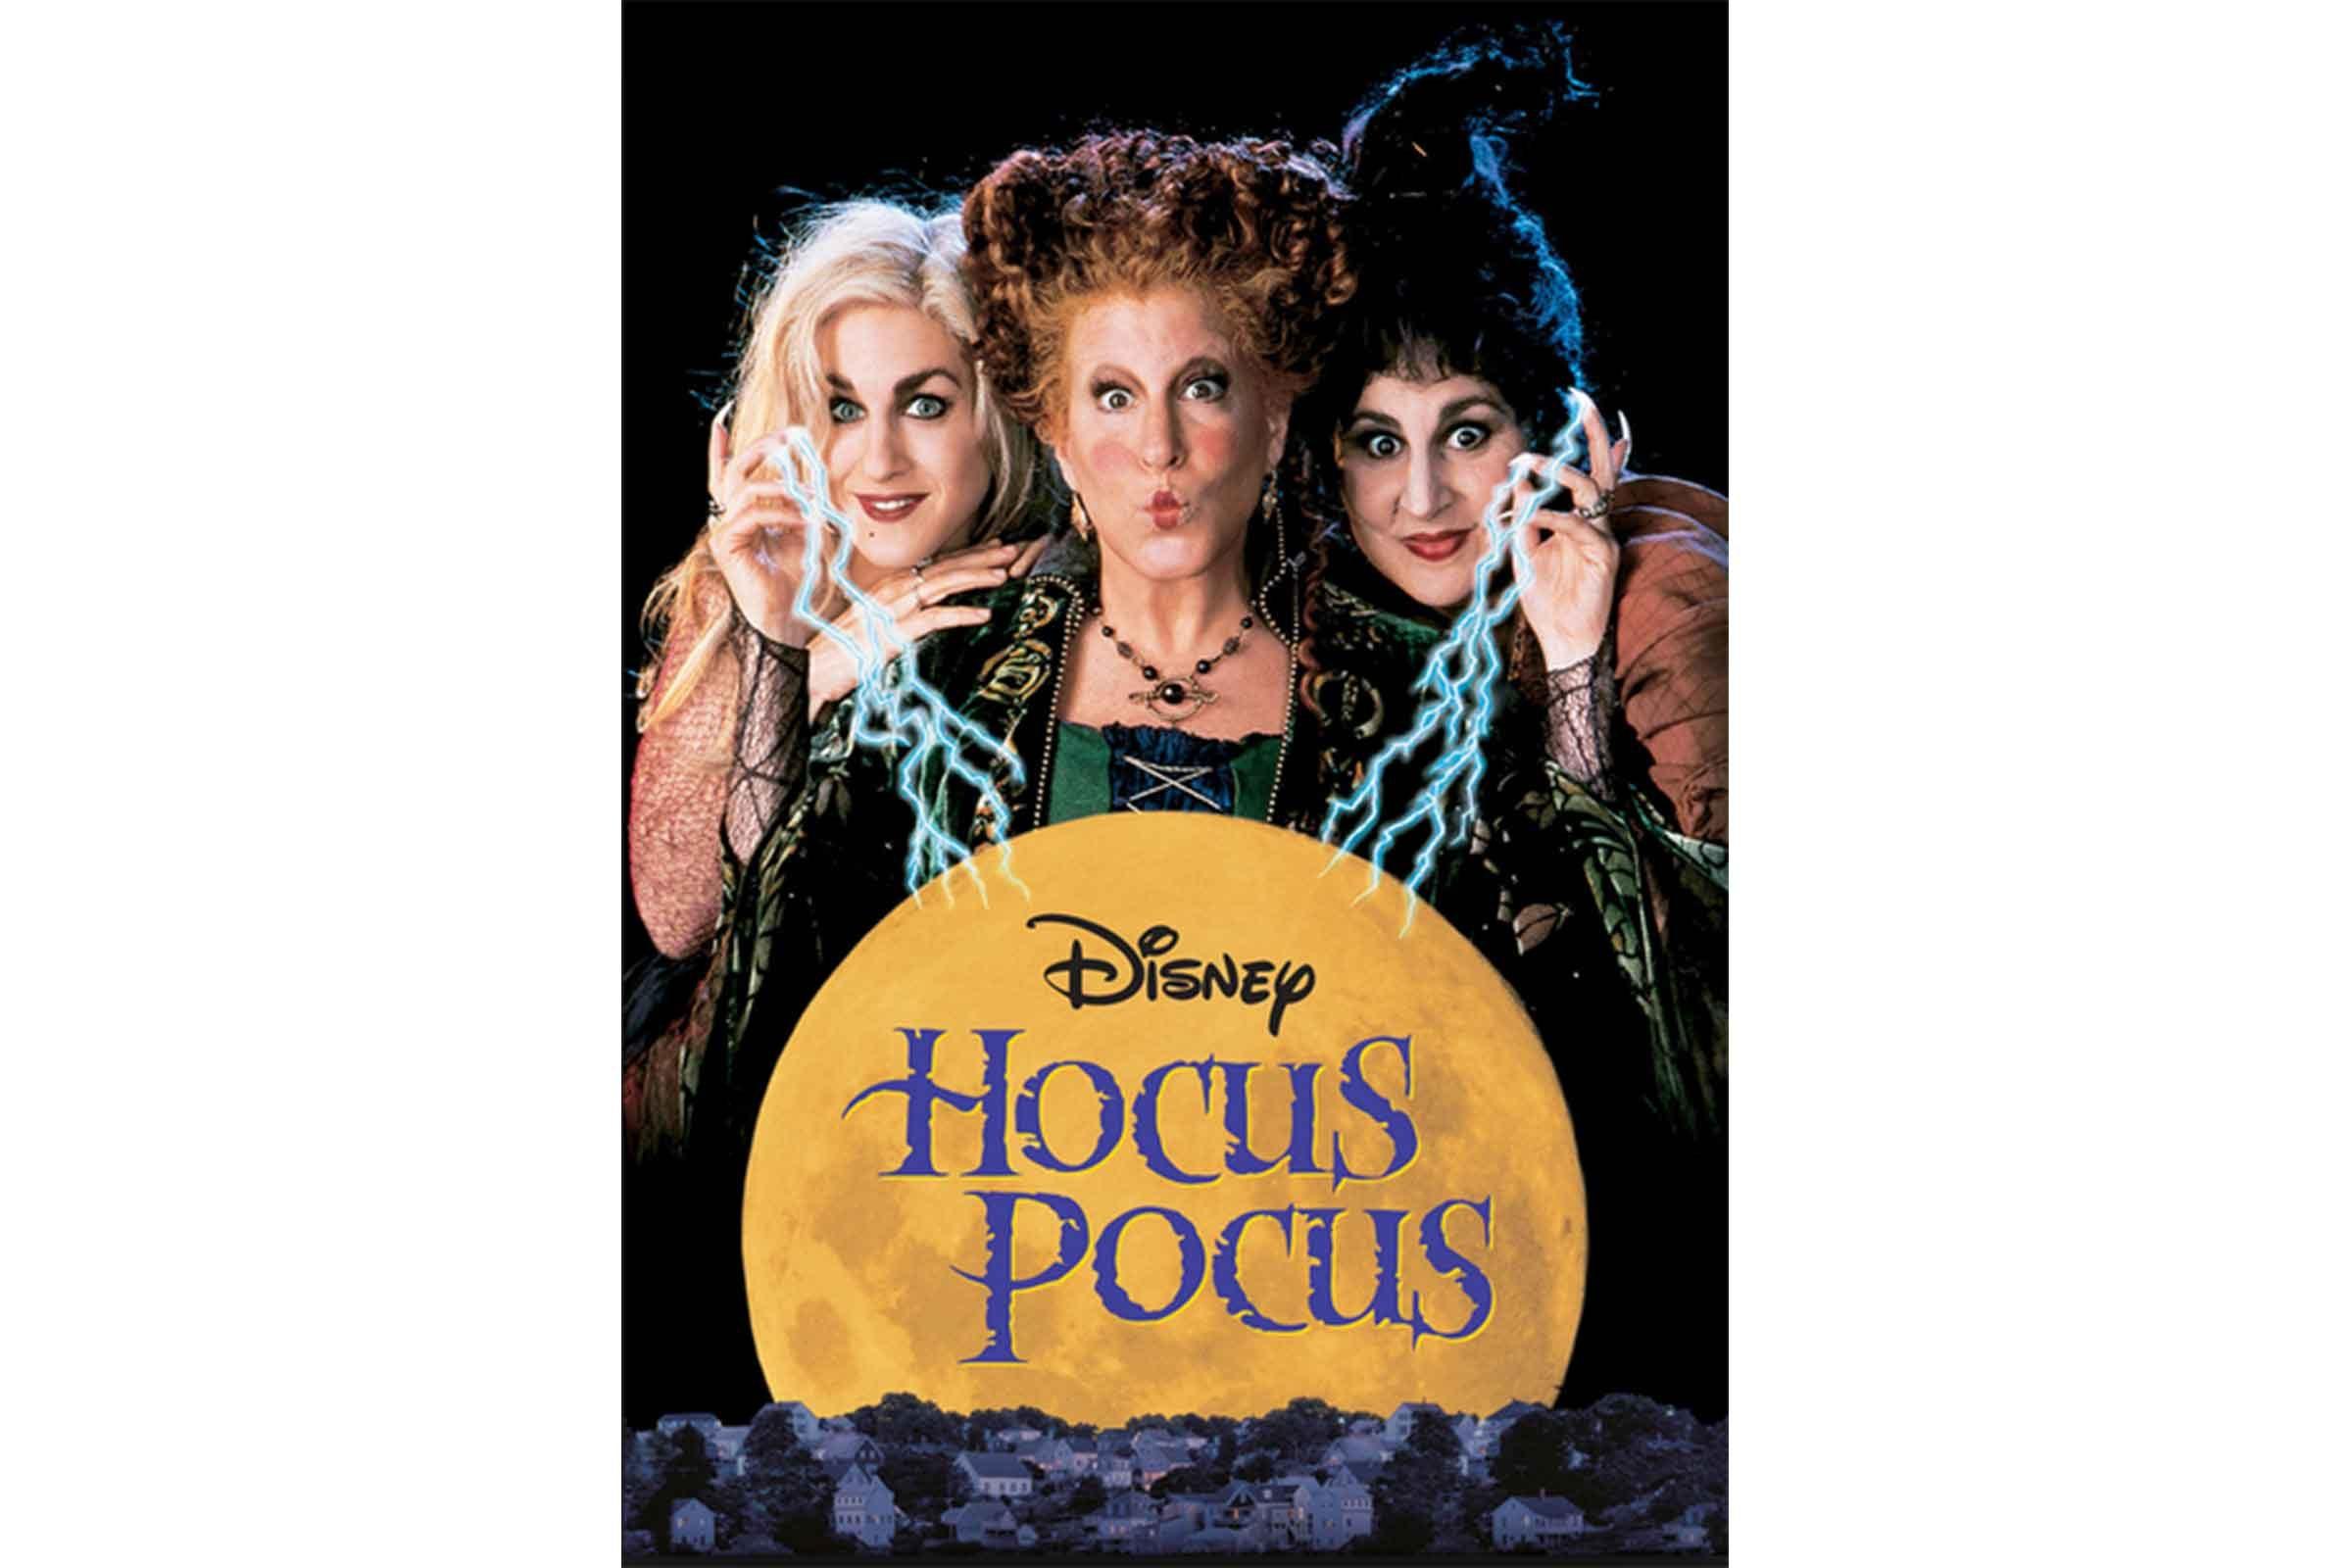 popular kids halloween movies - author of wild movie